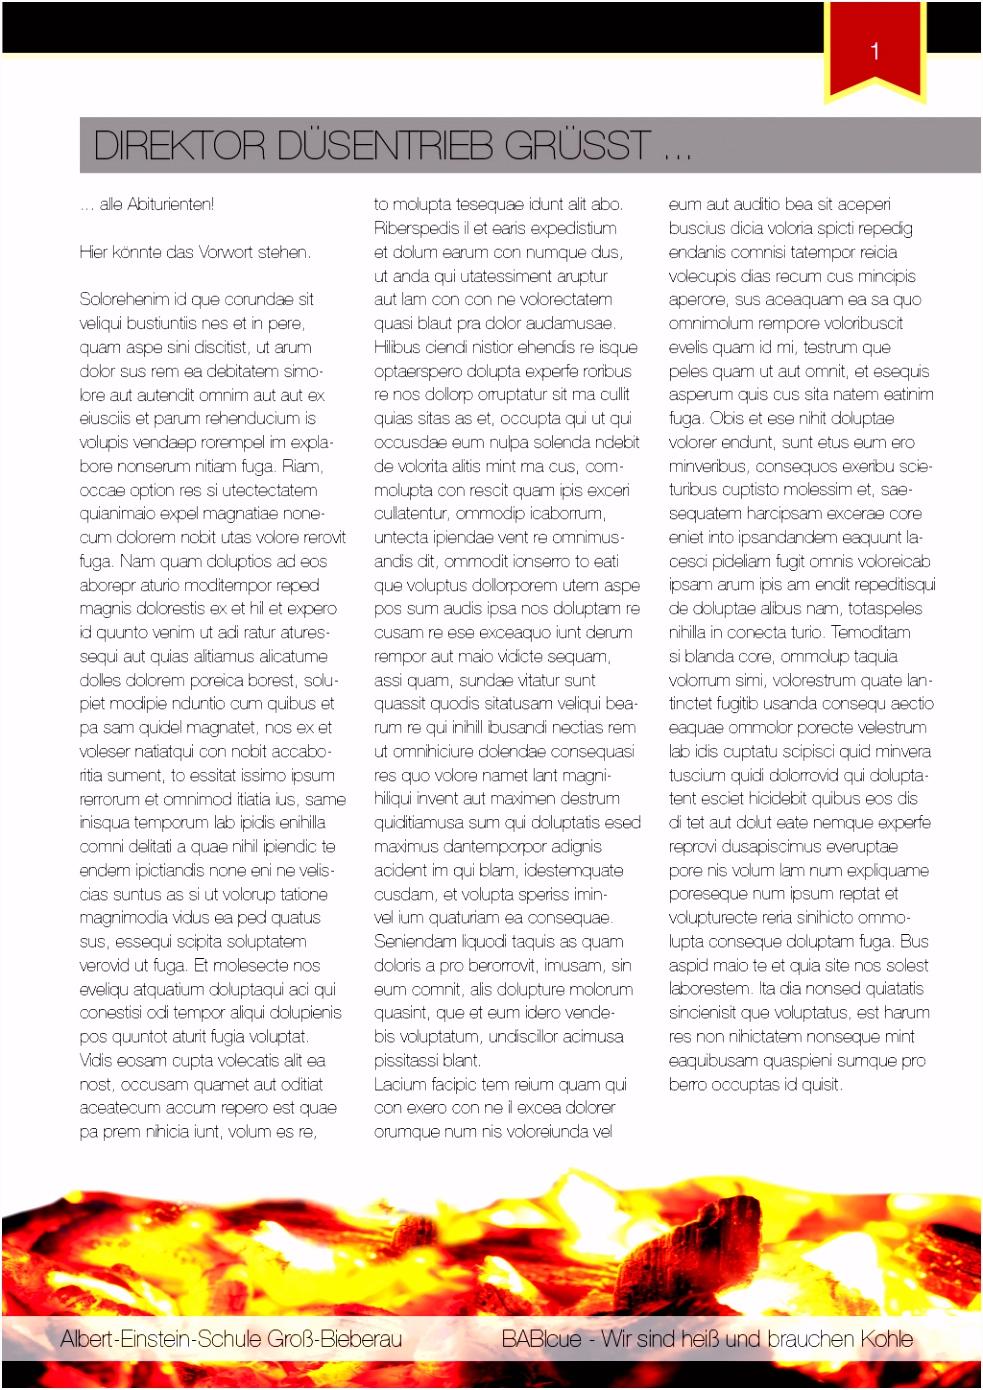 Blog printaholics Druck Eurer Abizeitung